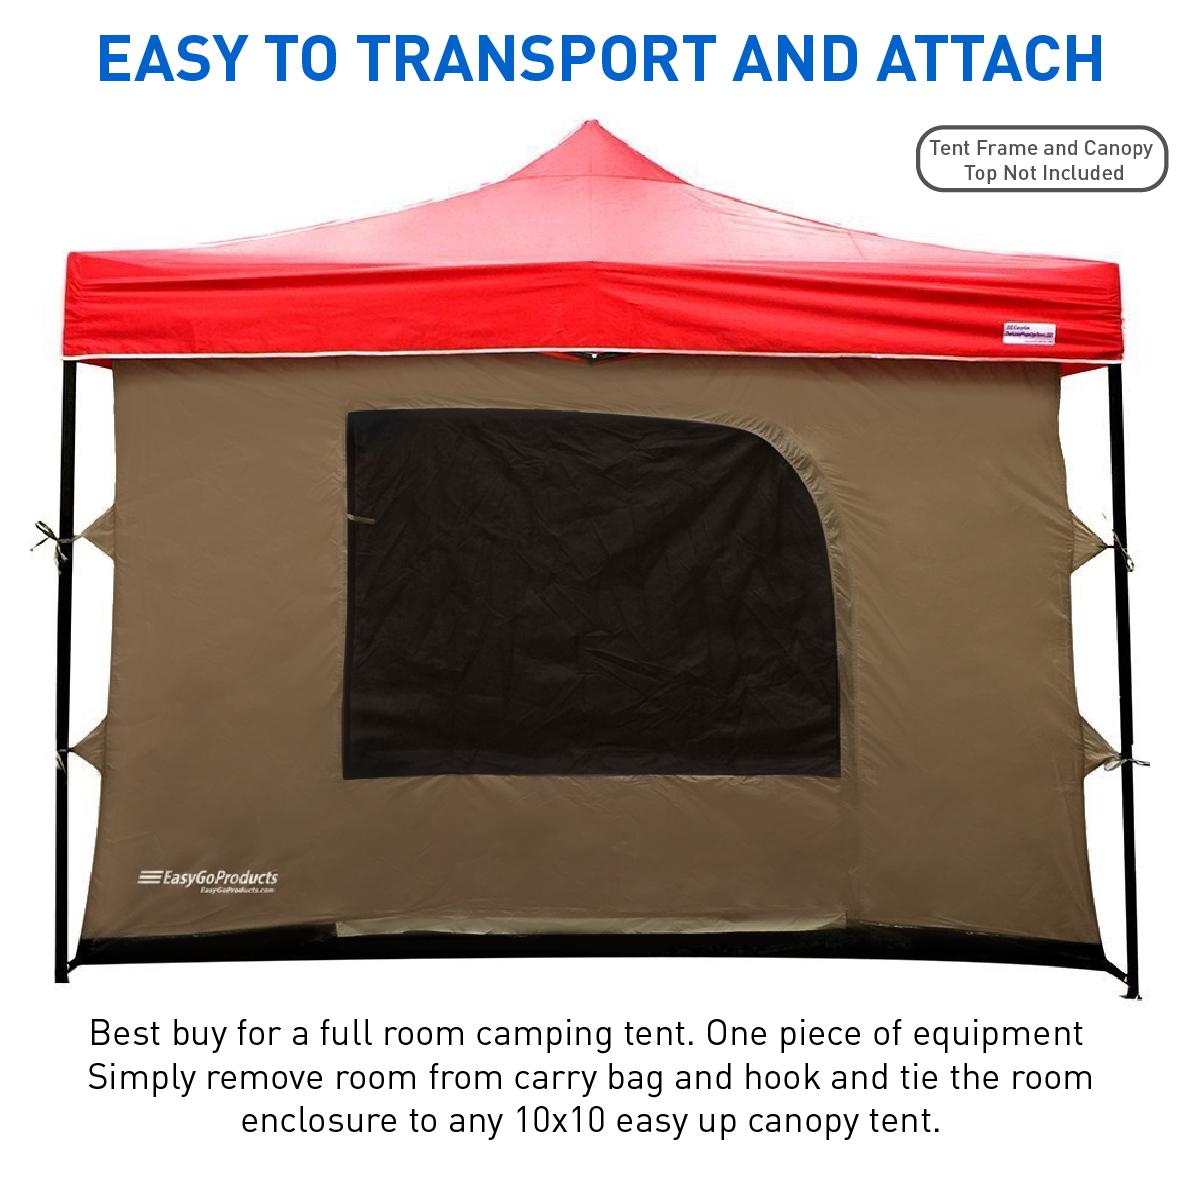 C&ing Tent attaches to any 10u0027x10u0027 Easy Up Pop Up Canopy Tent w/4 Walls Mesh Ceiling PVC Floor 2 Doorsu0026 4 Windows - Walmart.com  sc 1 st  Walmart & Camping Tent attaches to any 10u0027x10u0027 Easy Up Pop Up Canopy Tent w ...